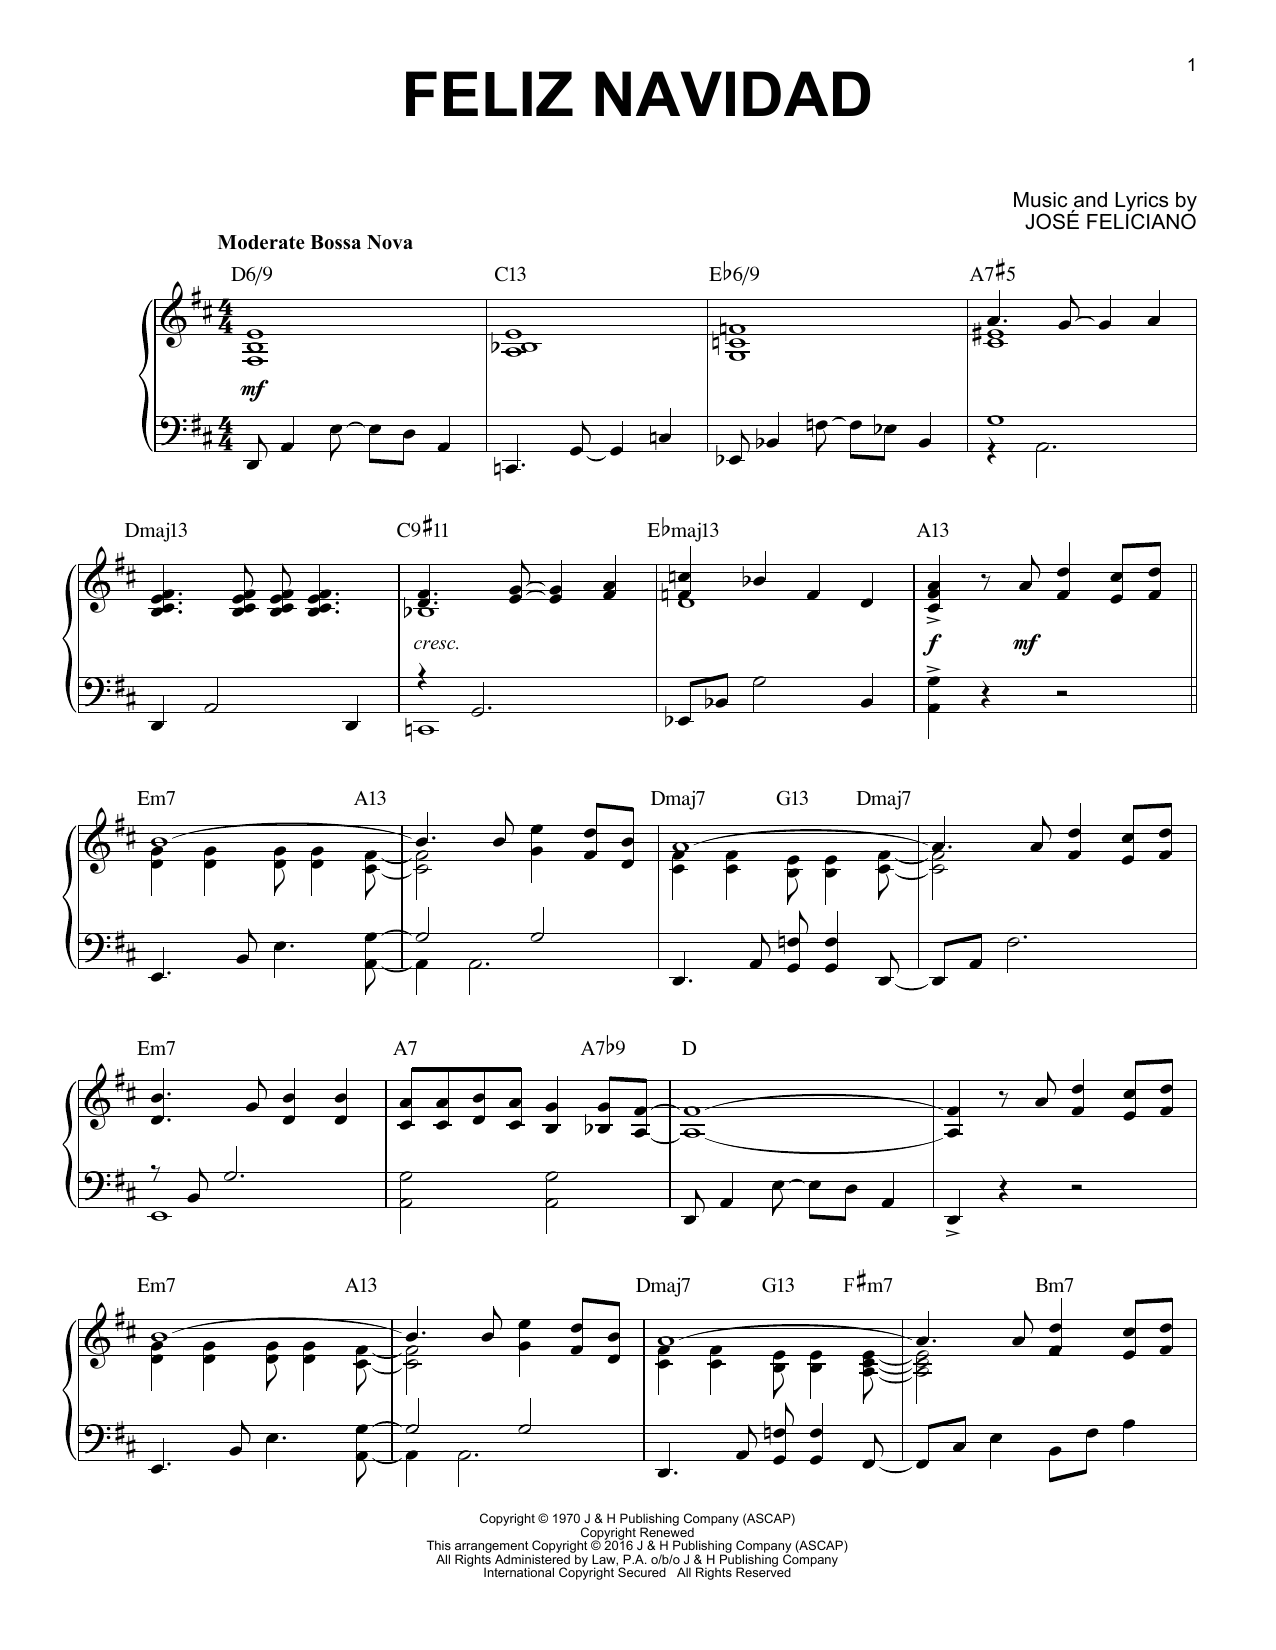 Jose Feliciano Feliz Navidad [Jazz version] (arr. Brent Edstrom) sheet music notes and chords. Download Printable PDF.